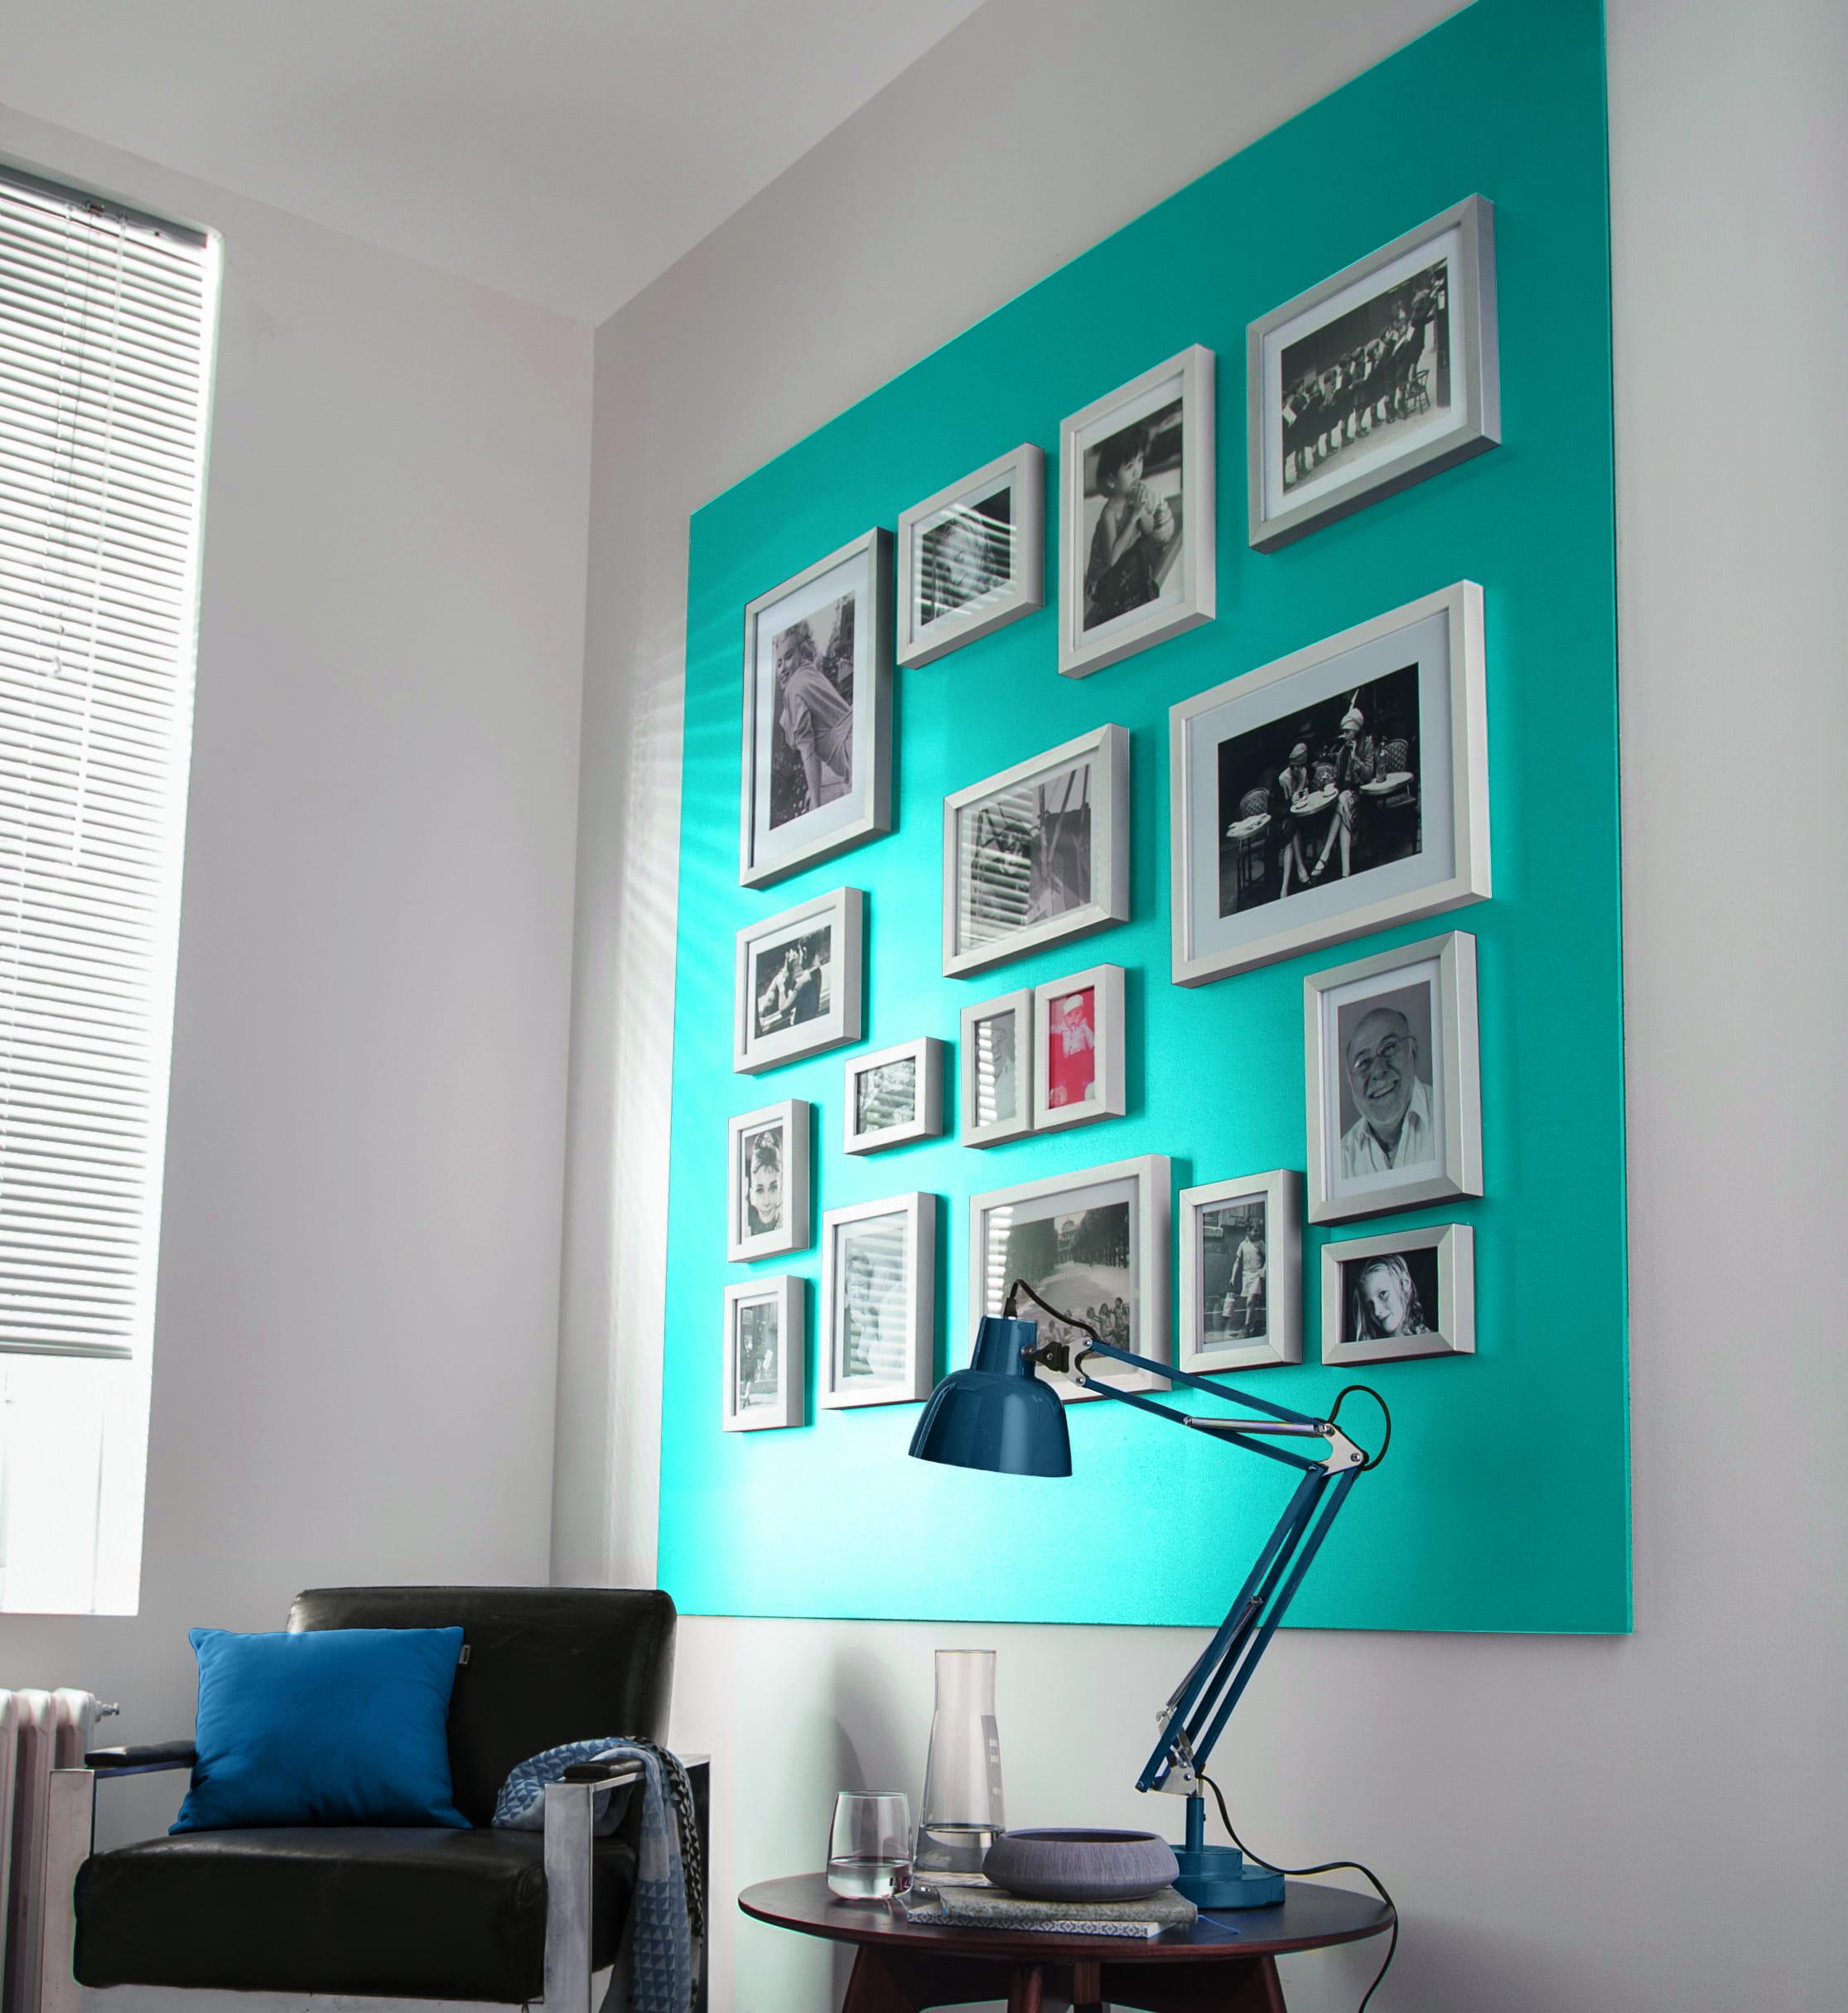 Salle de bain coloree castorama for Peinture par bain